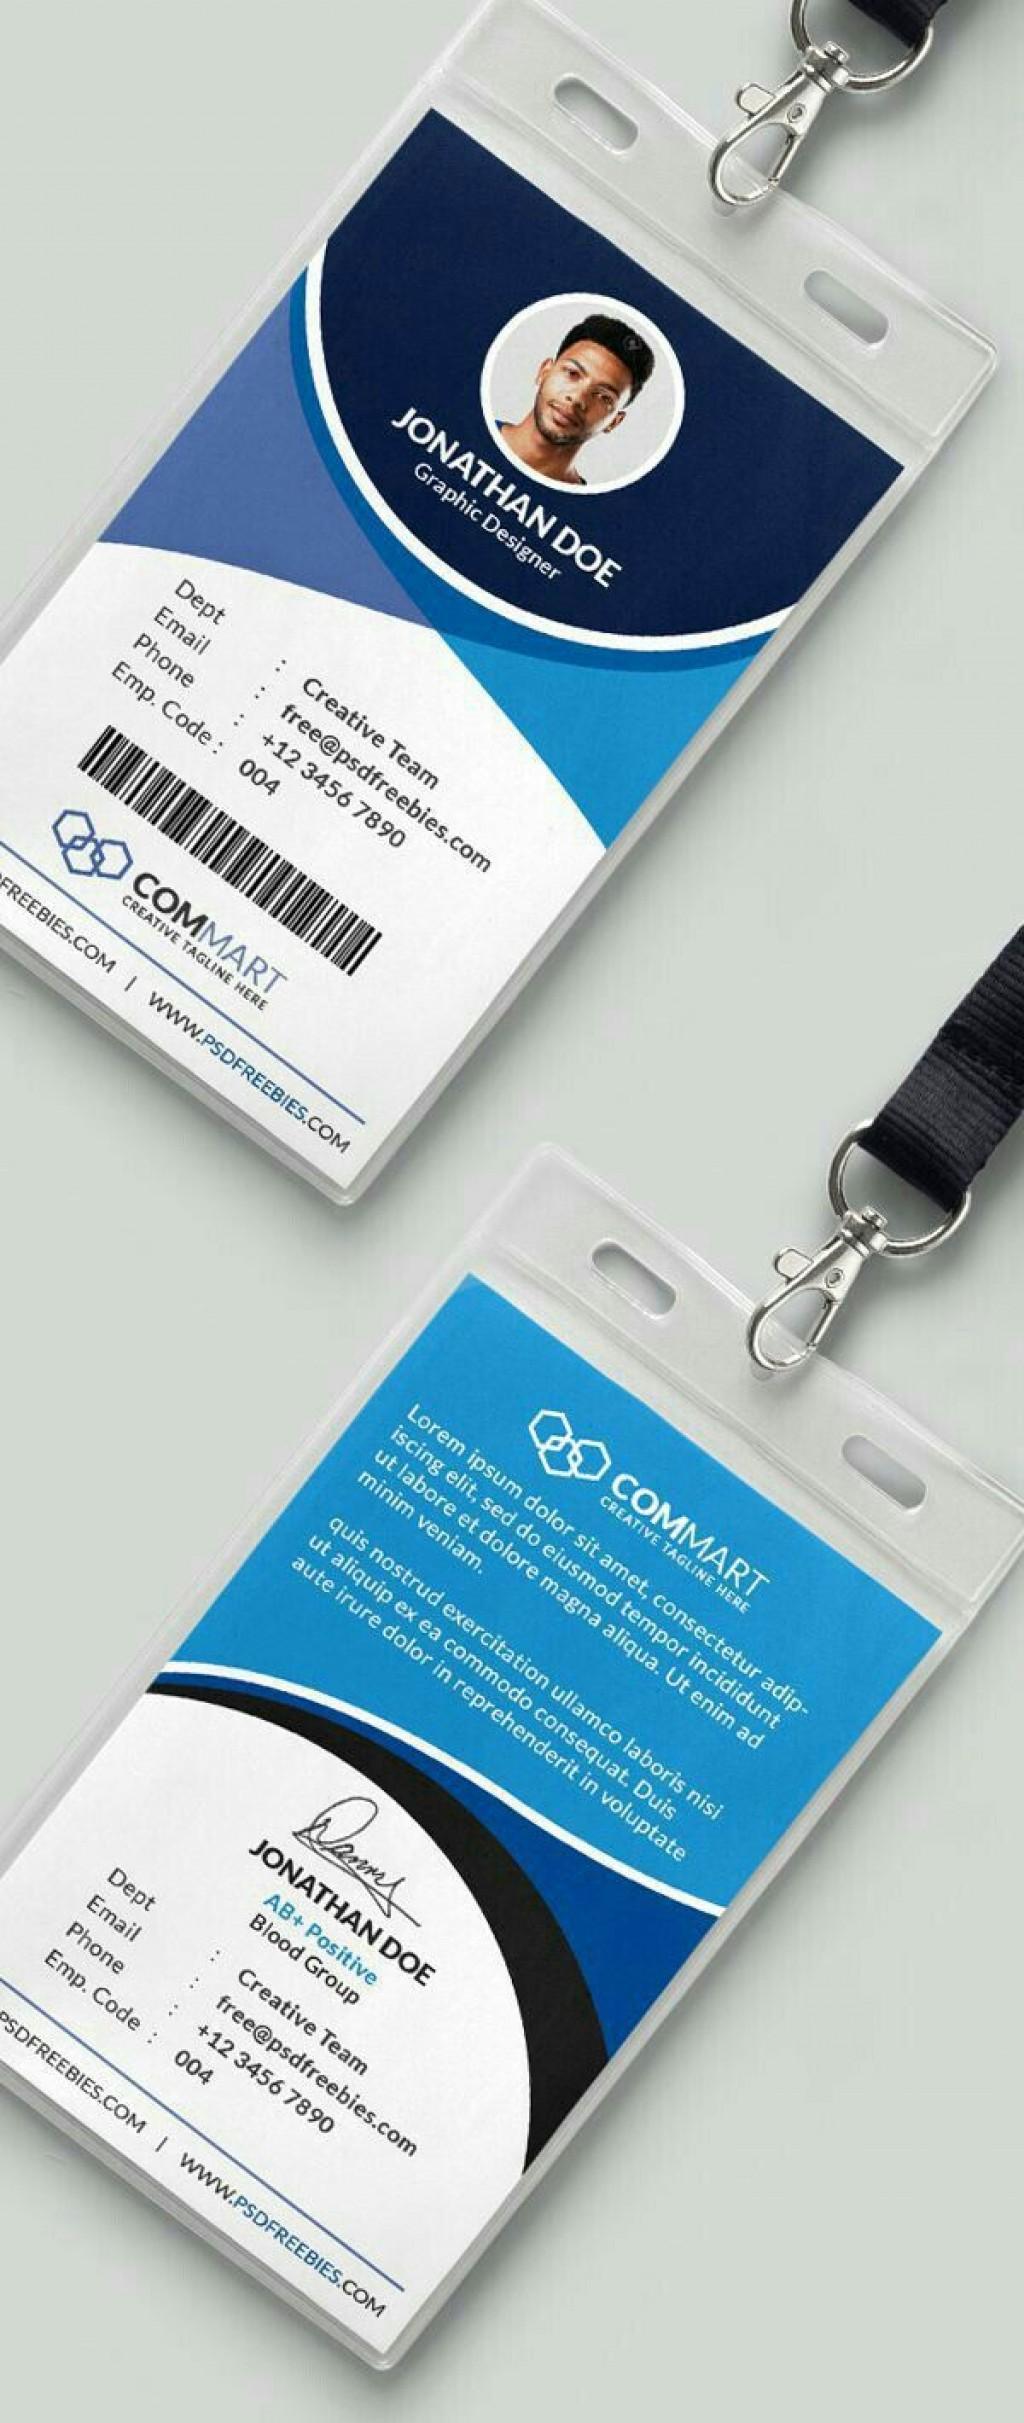 005 Striking Id Card Template Free Idea  Download Pdf DesignLarge